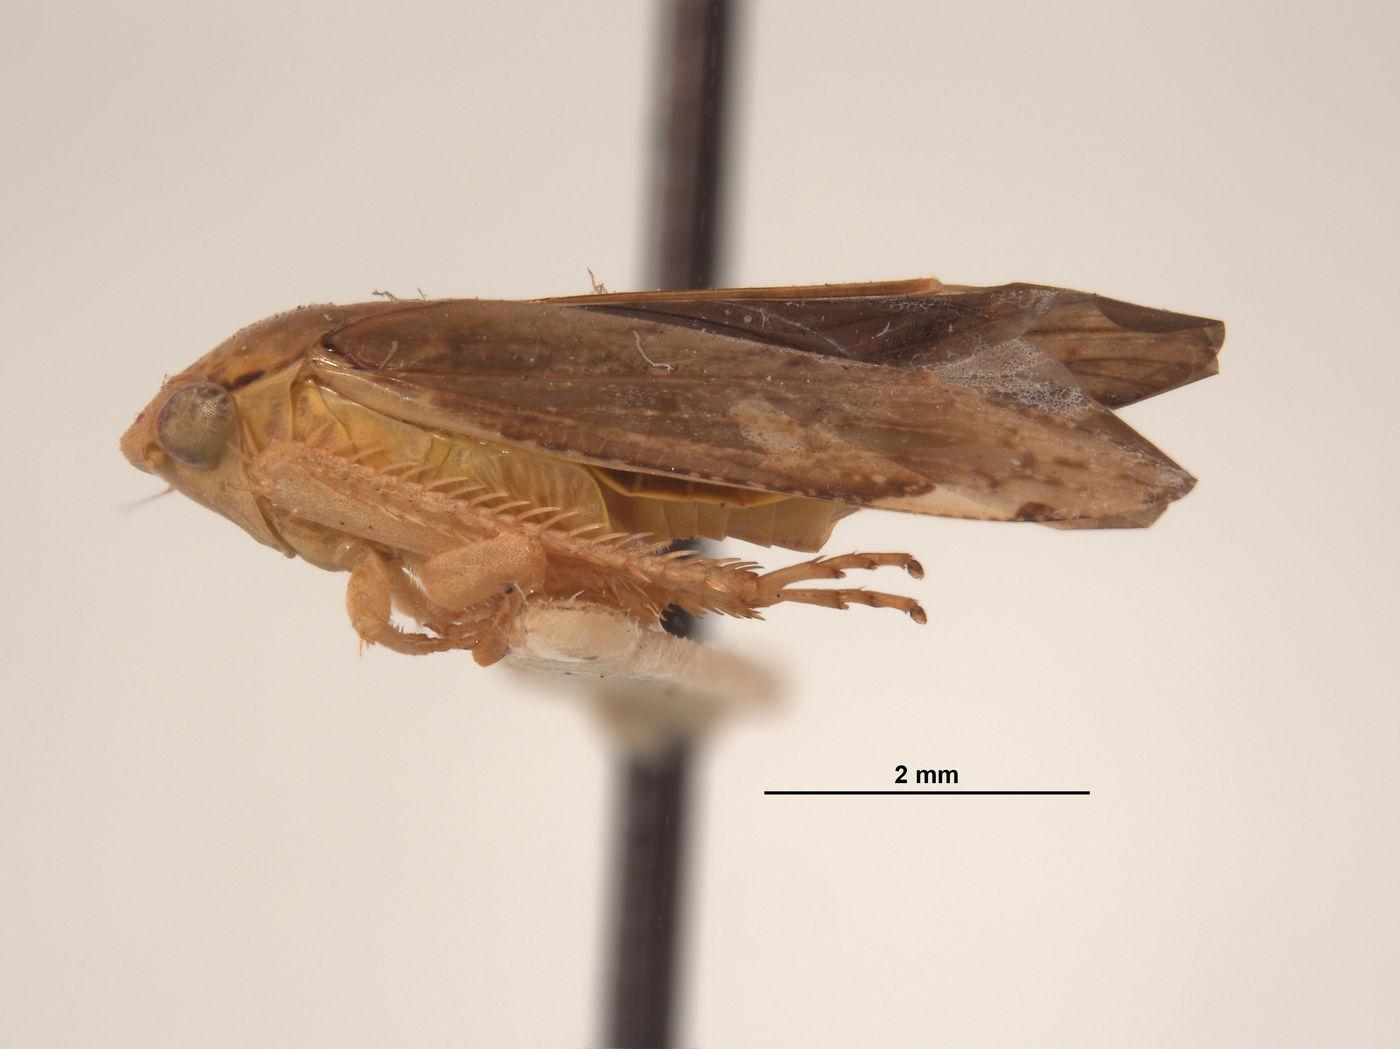 Gypona image